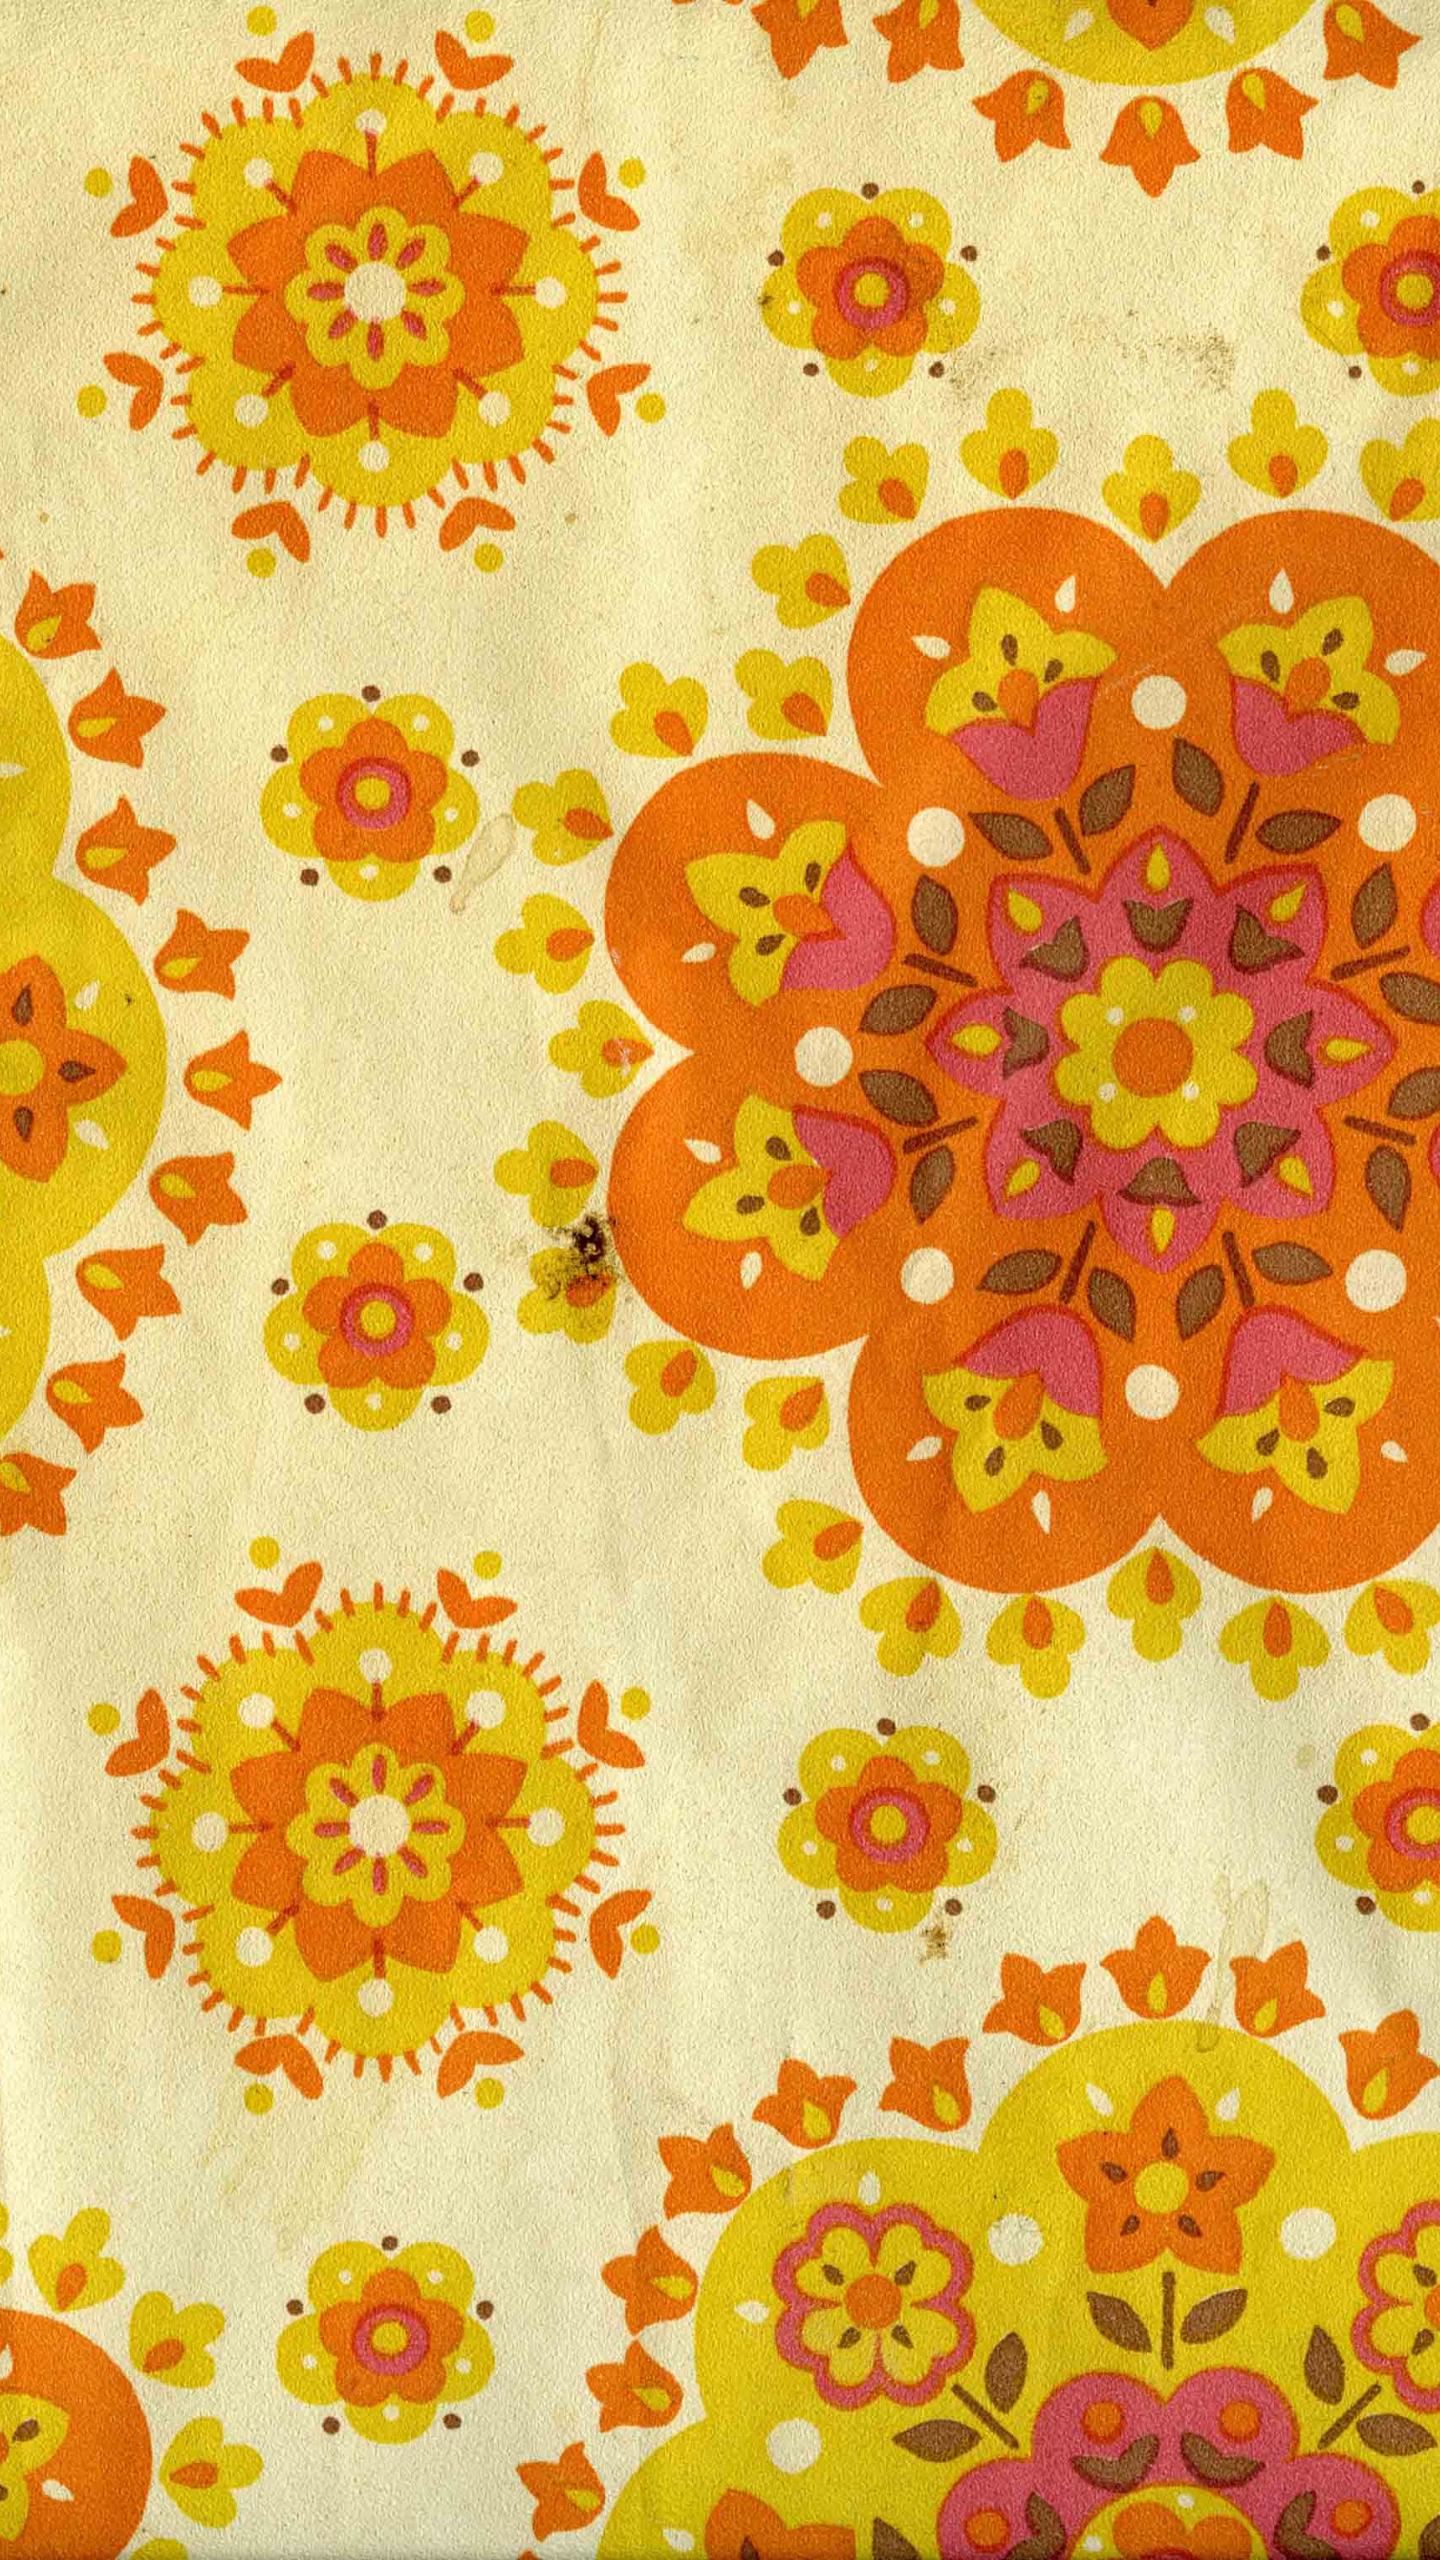 Free Download Wallpaper 60s 70s Yellow Orange Floral